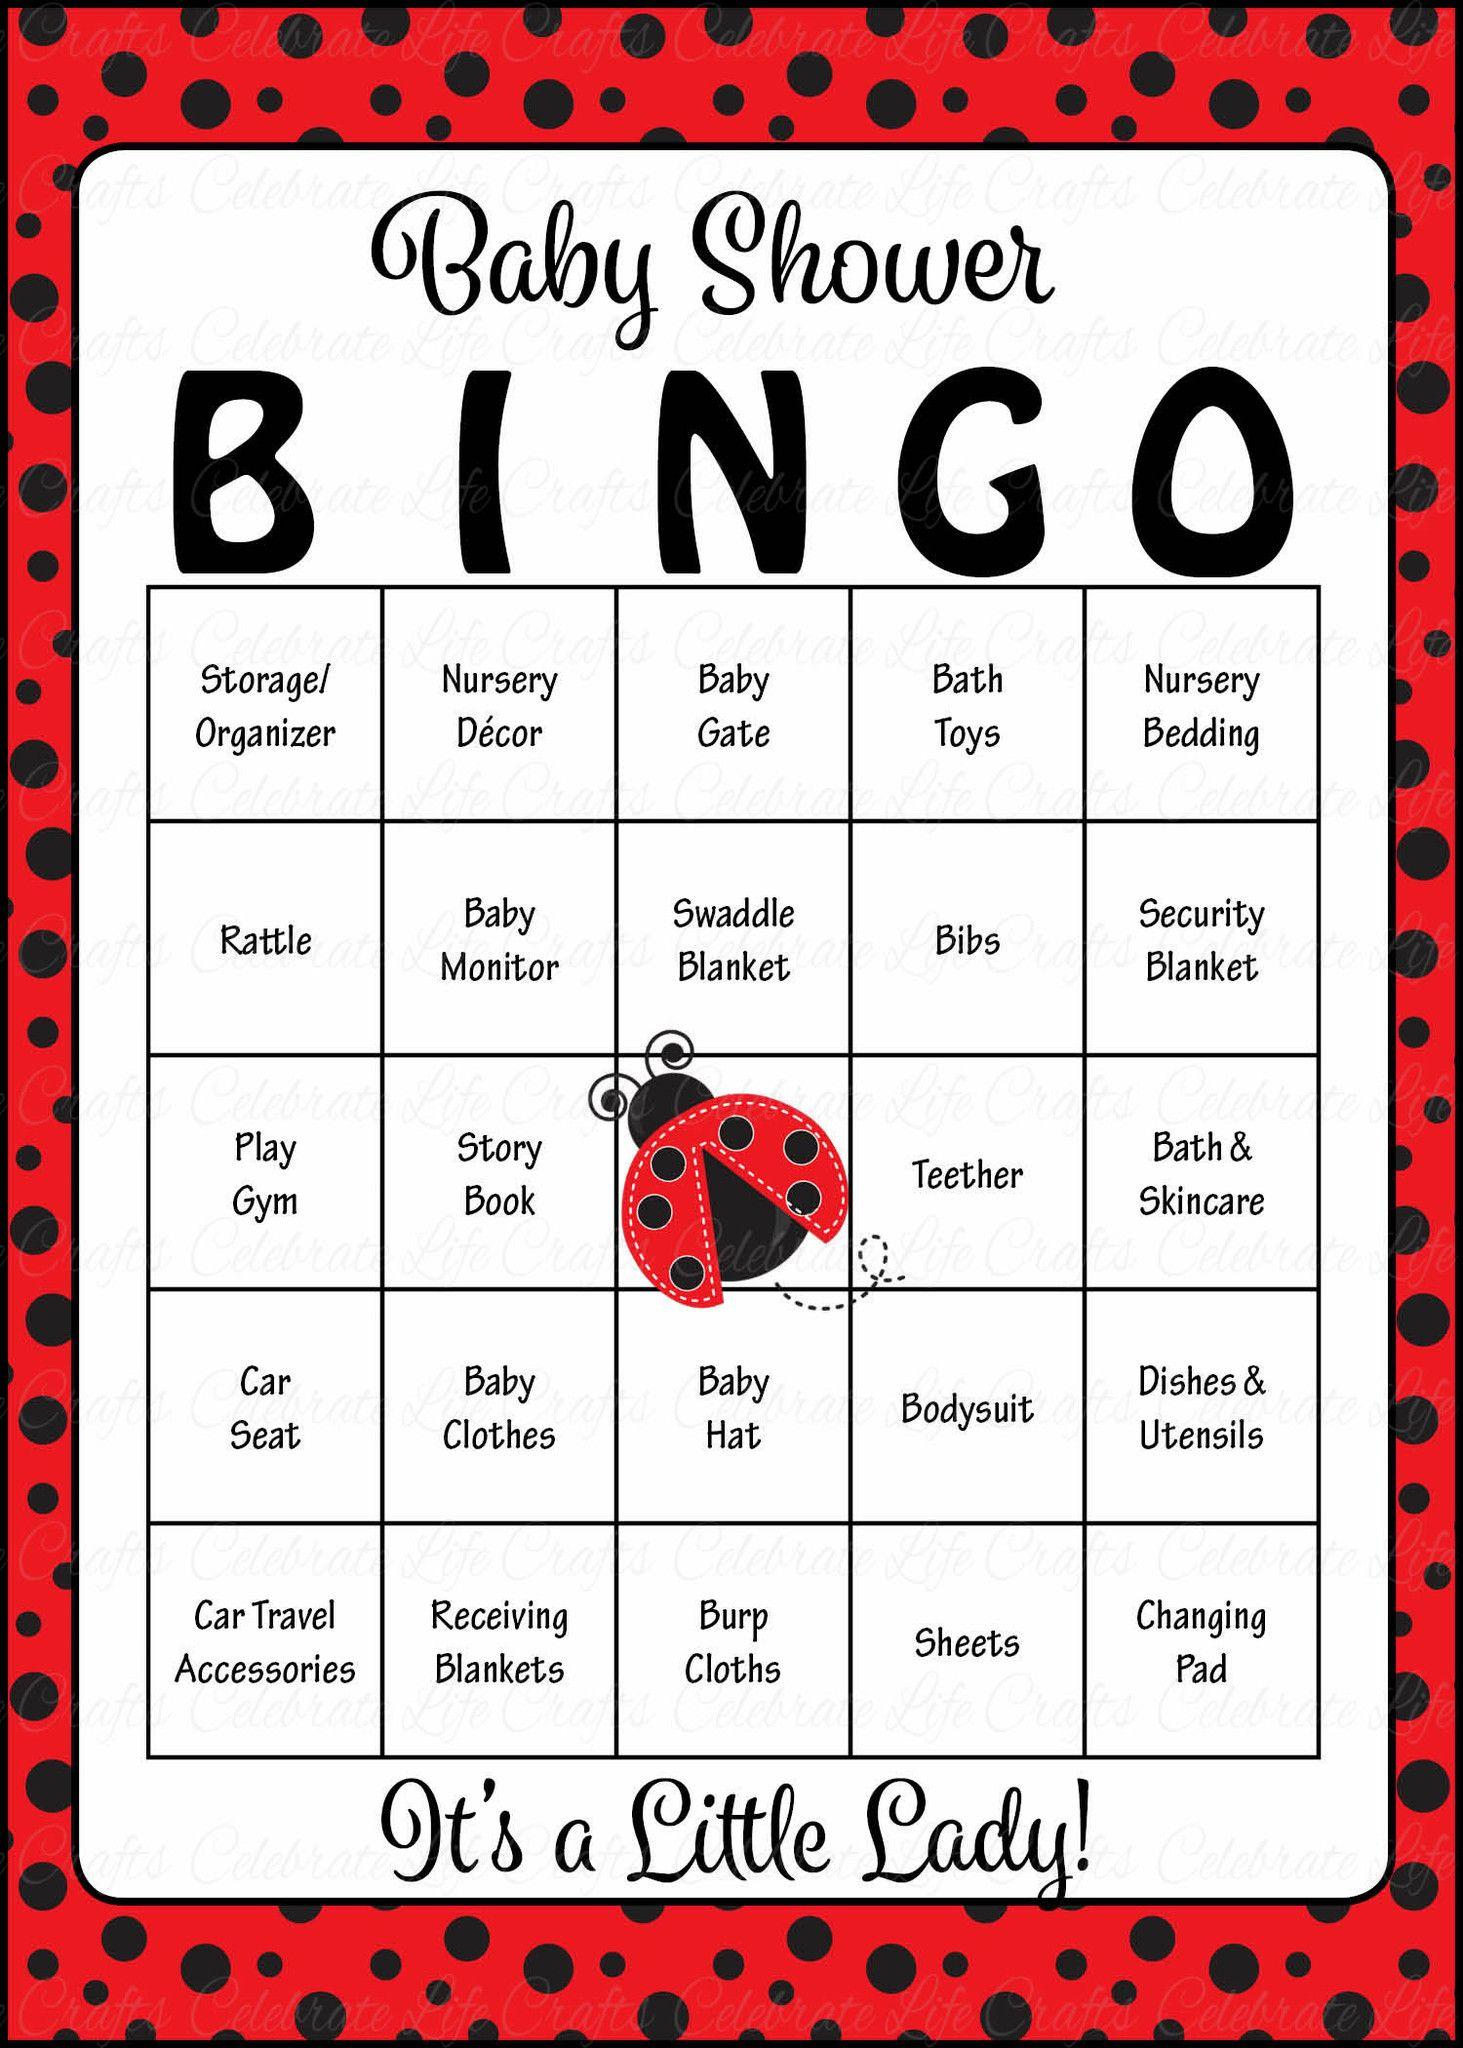 Ladybug Baby Bingo Cards - Printable Download - Prefilled